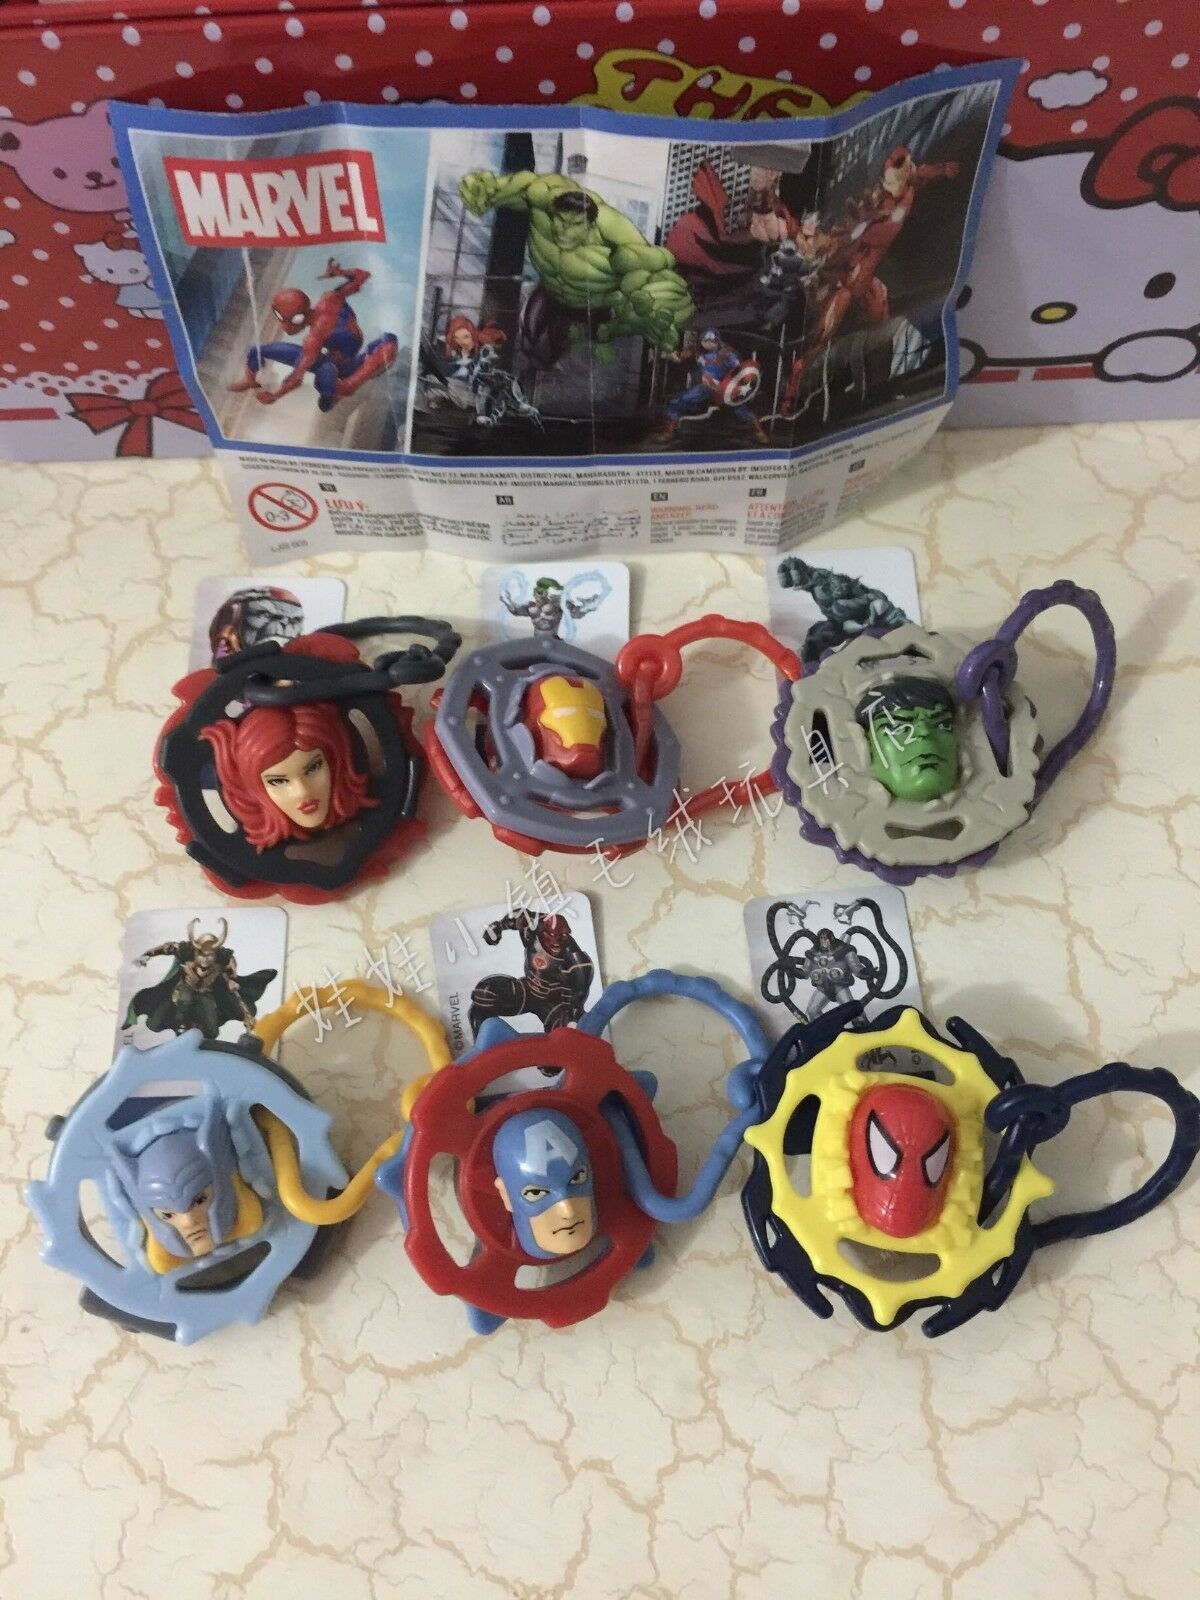 Kinder Surprise Marvel Spiderman Avengers Set 6 BPZ Boys Toys INDIA 2017 RARE